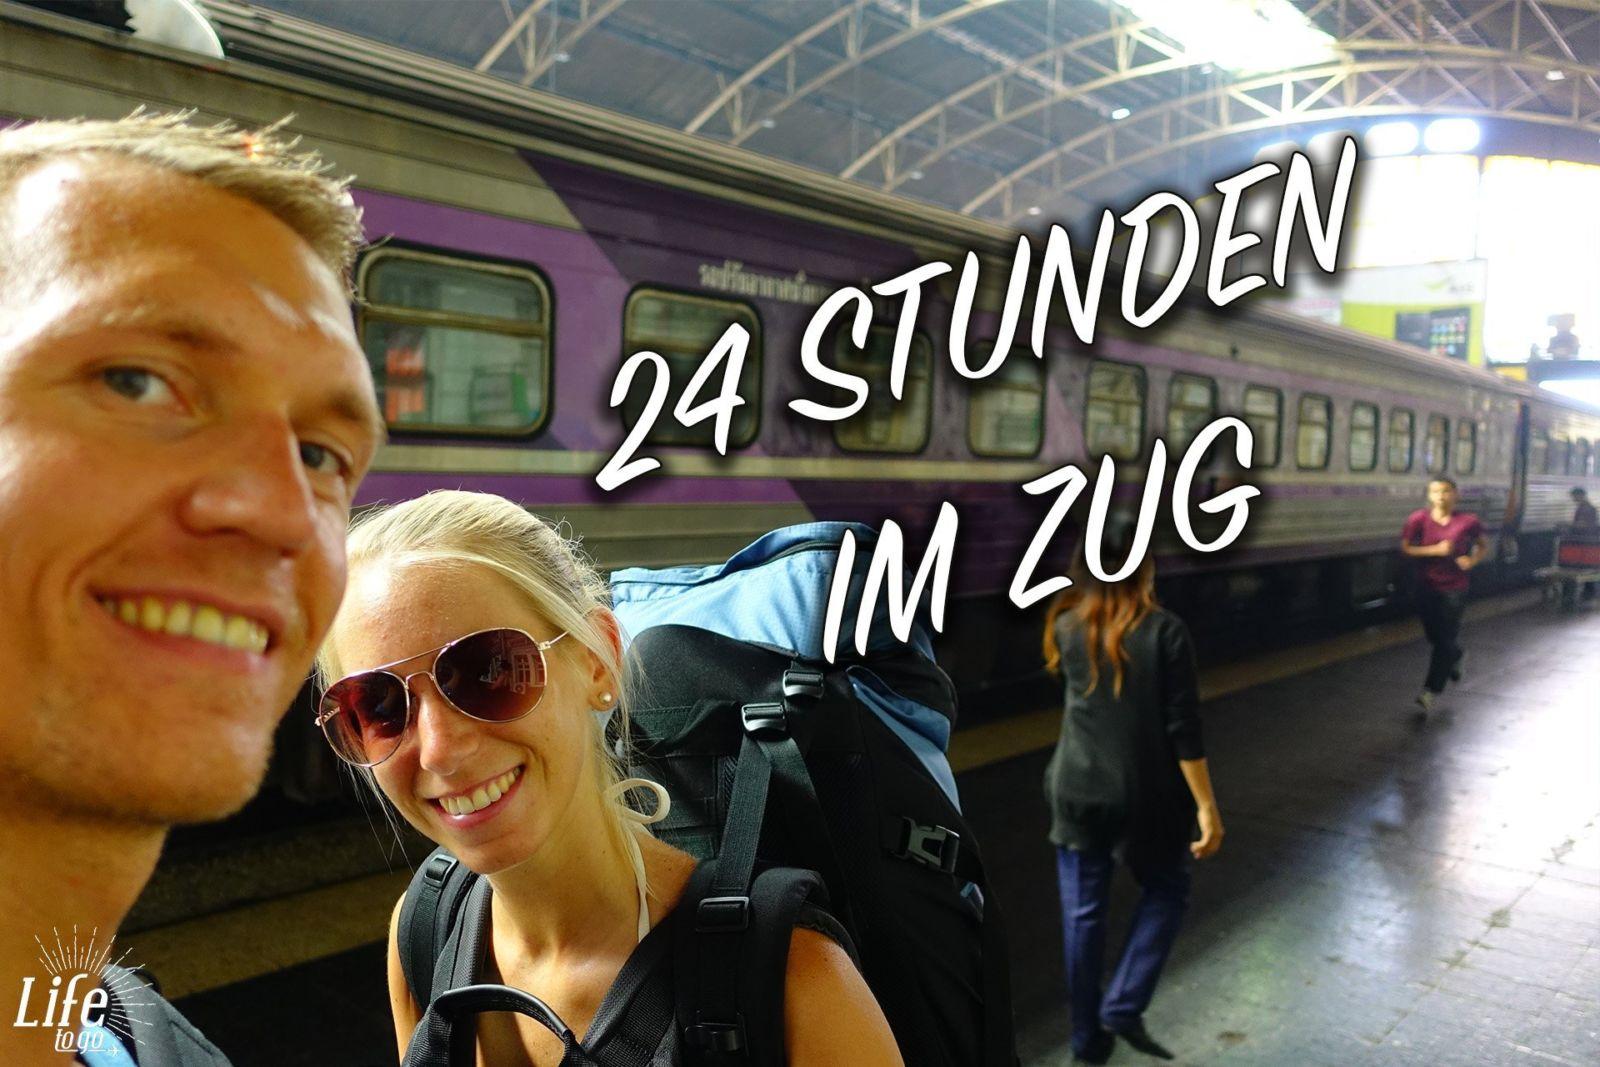 Bangkok nach Butterworth - per Zug in 24 Stunden - 1